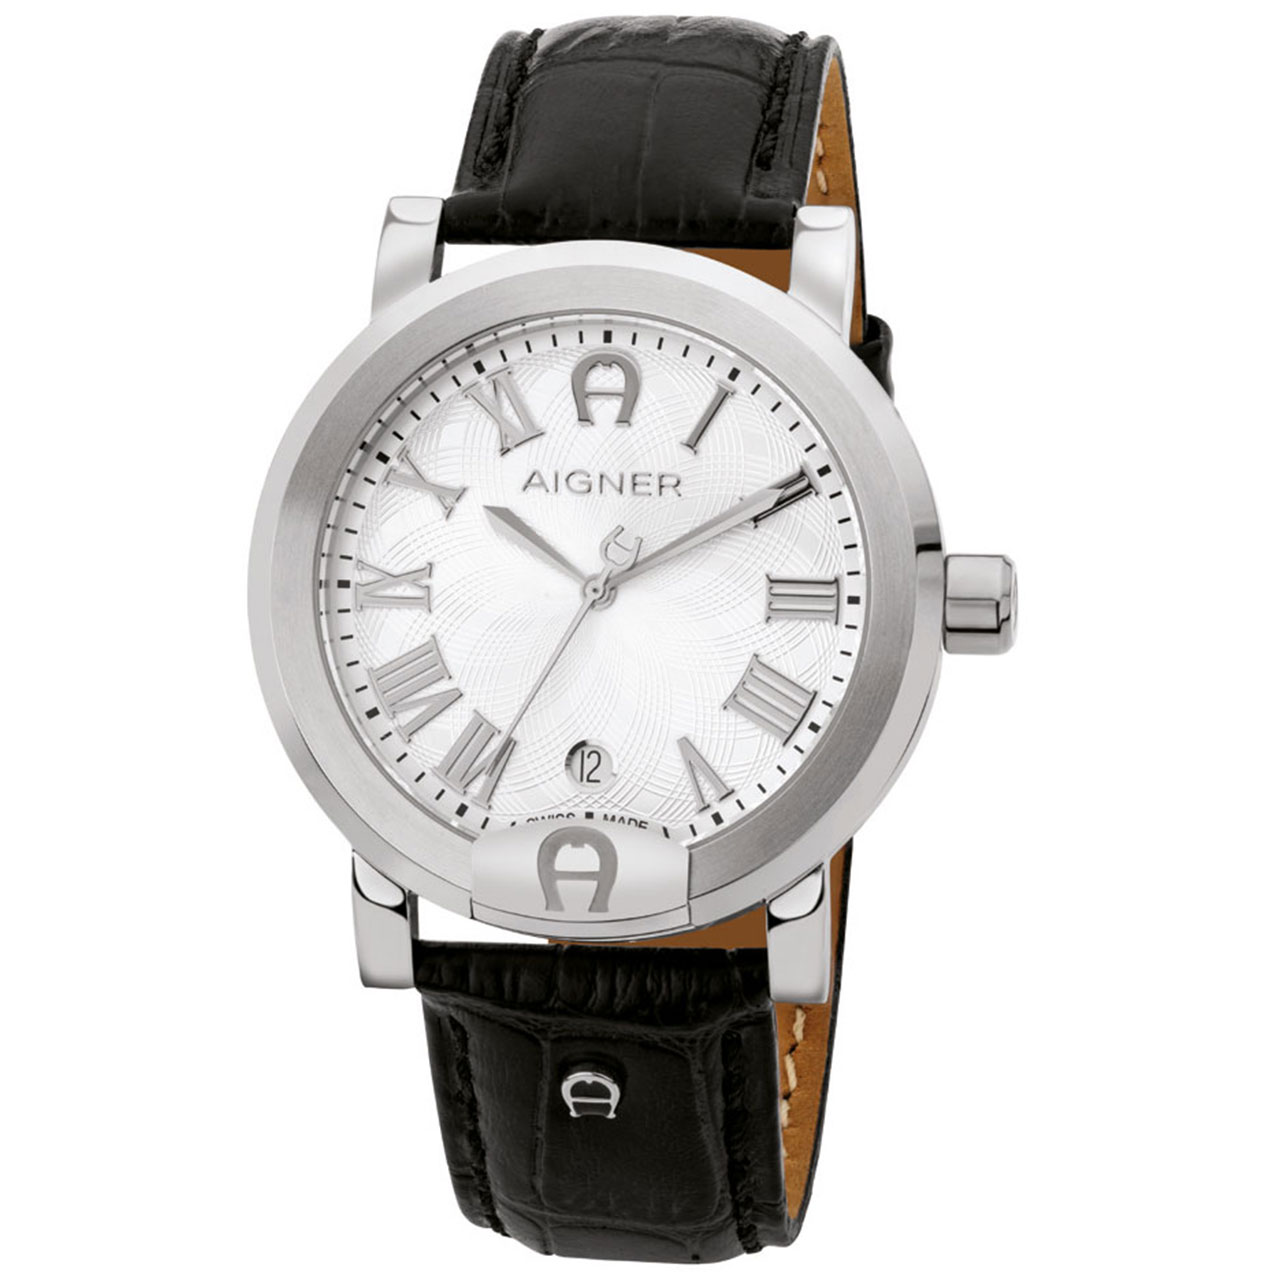 ساعت مچی عقربه ای مردانه اگنر مدل A103105